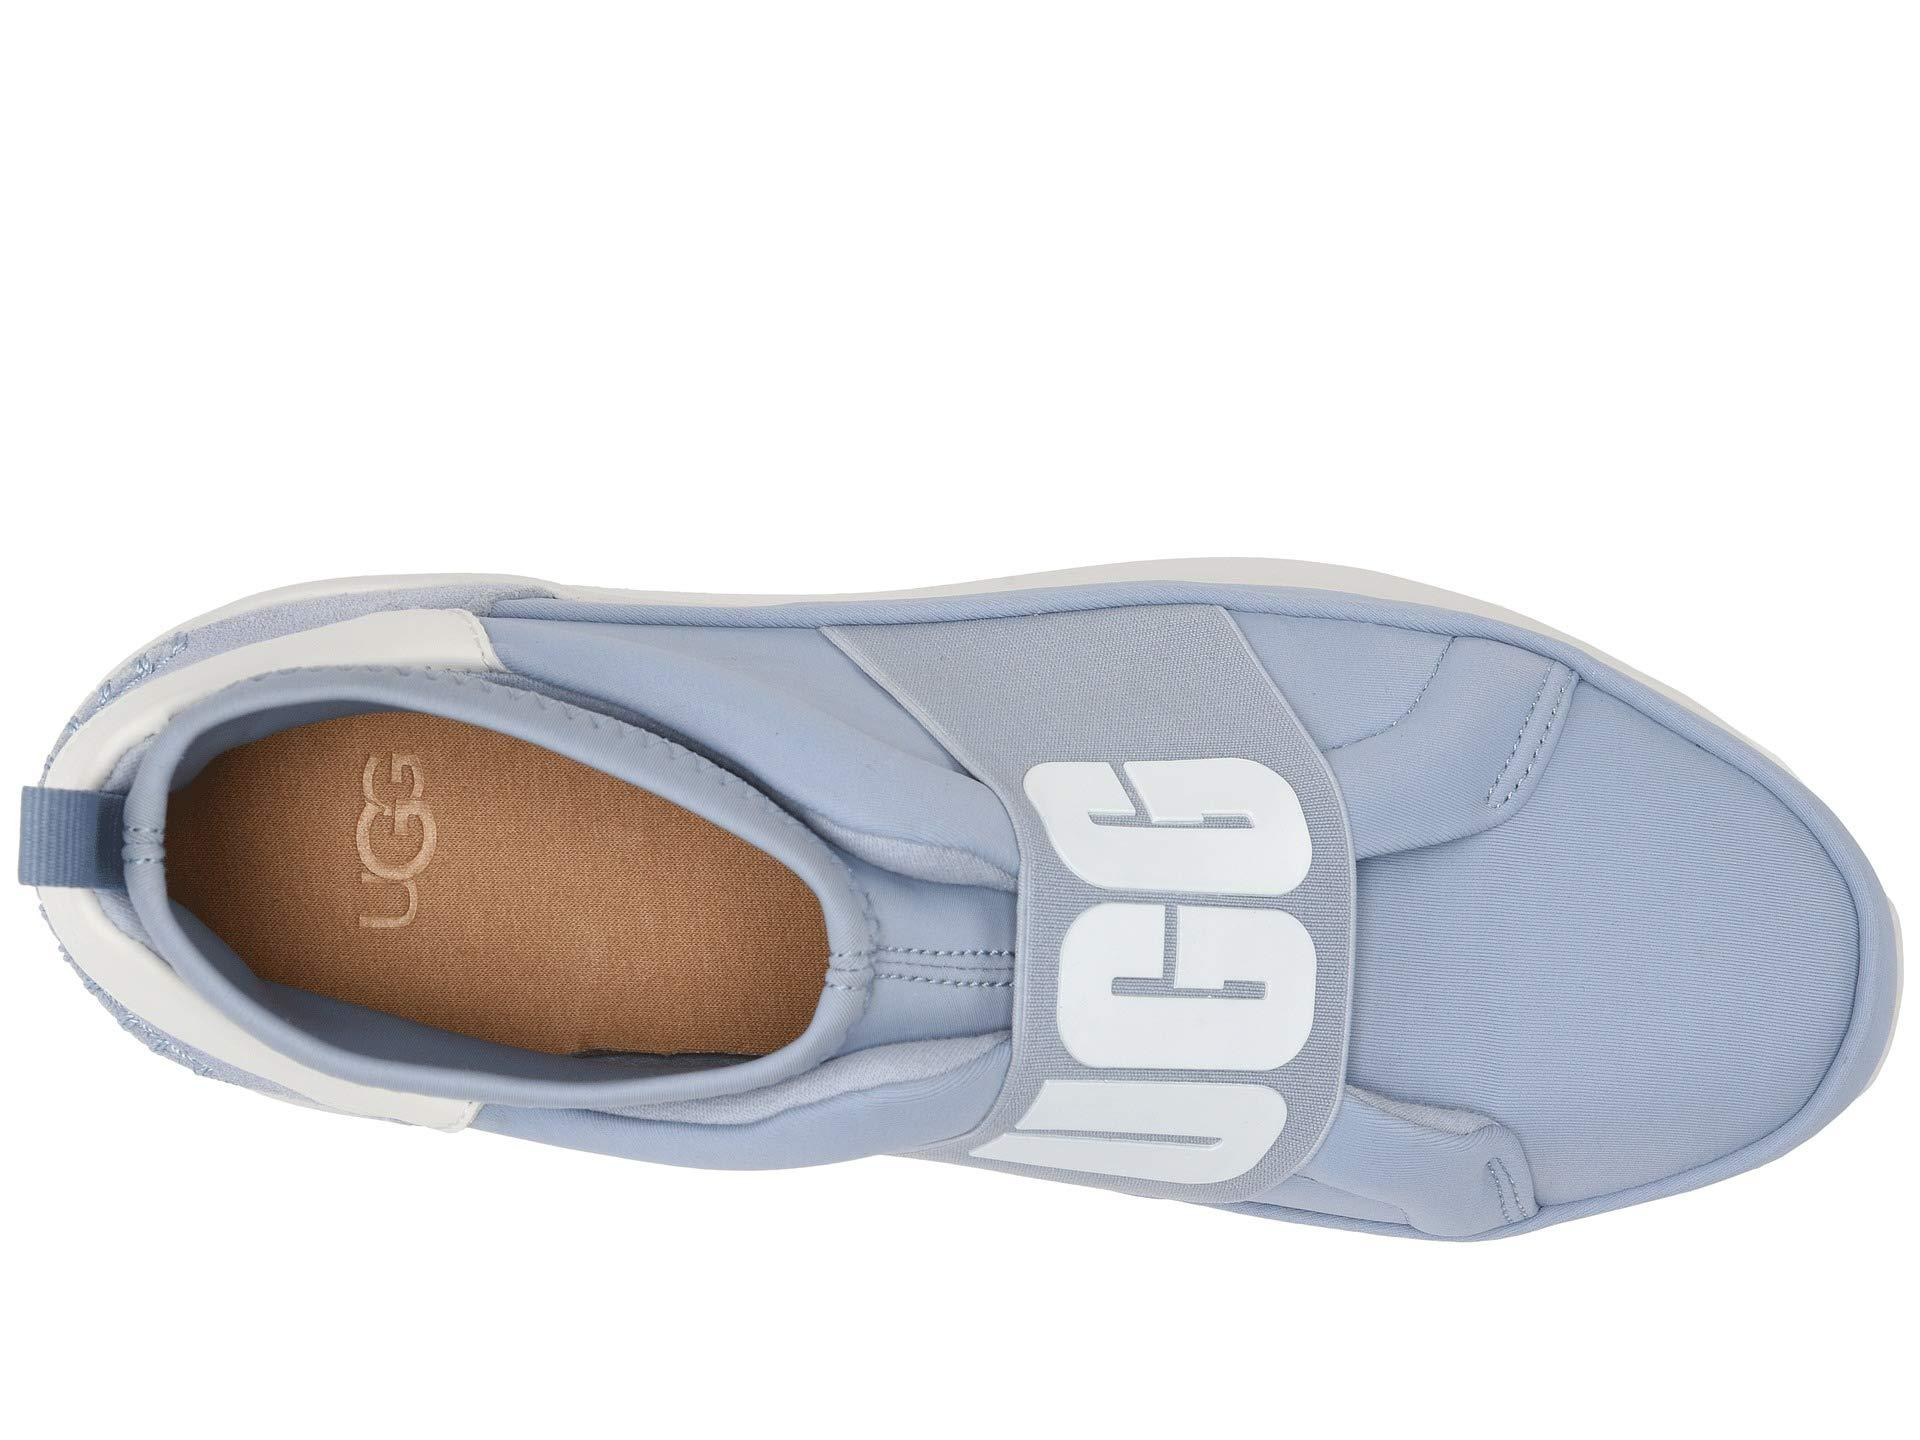 e17f9027a8d UGG Neutra Sneaker (pink Dawn) Women's Boots in Blue - Lyst